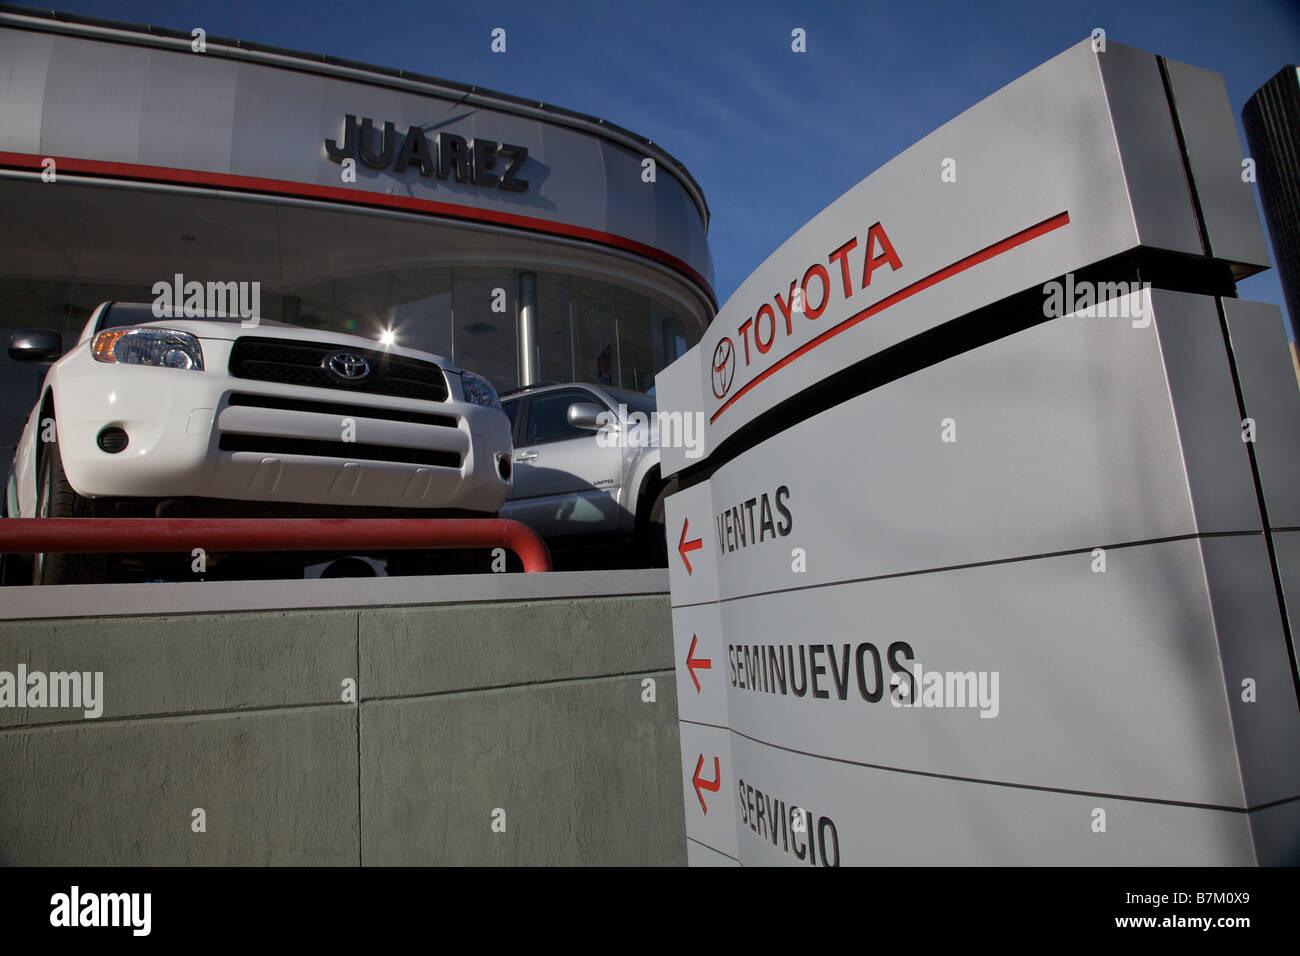 Toyota Denver DealershipsToyota Dealerships Alabama Toyota - Alabama toyota dealers